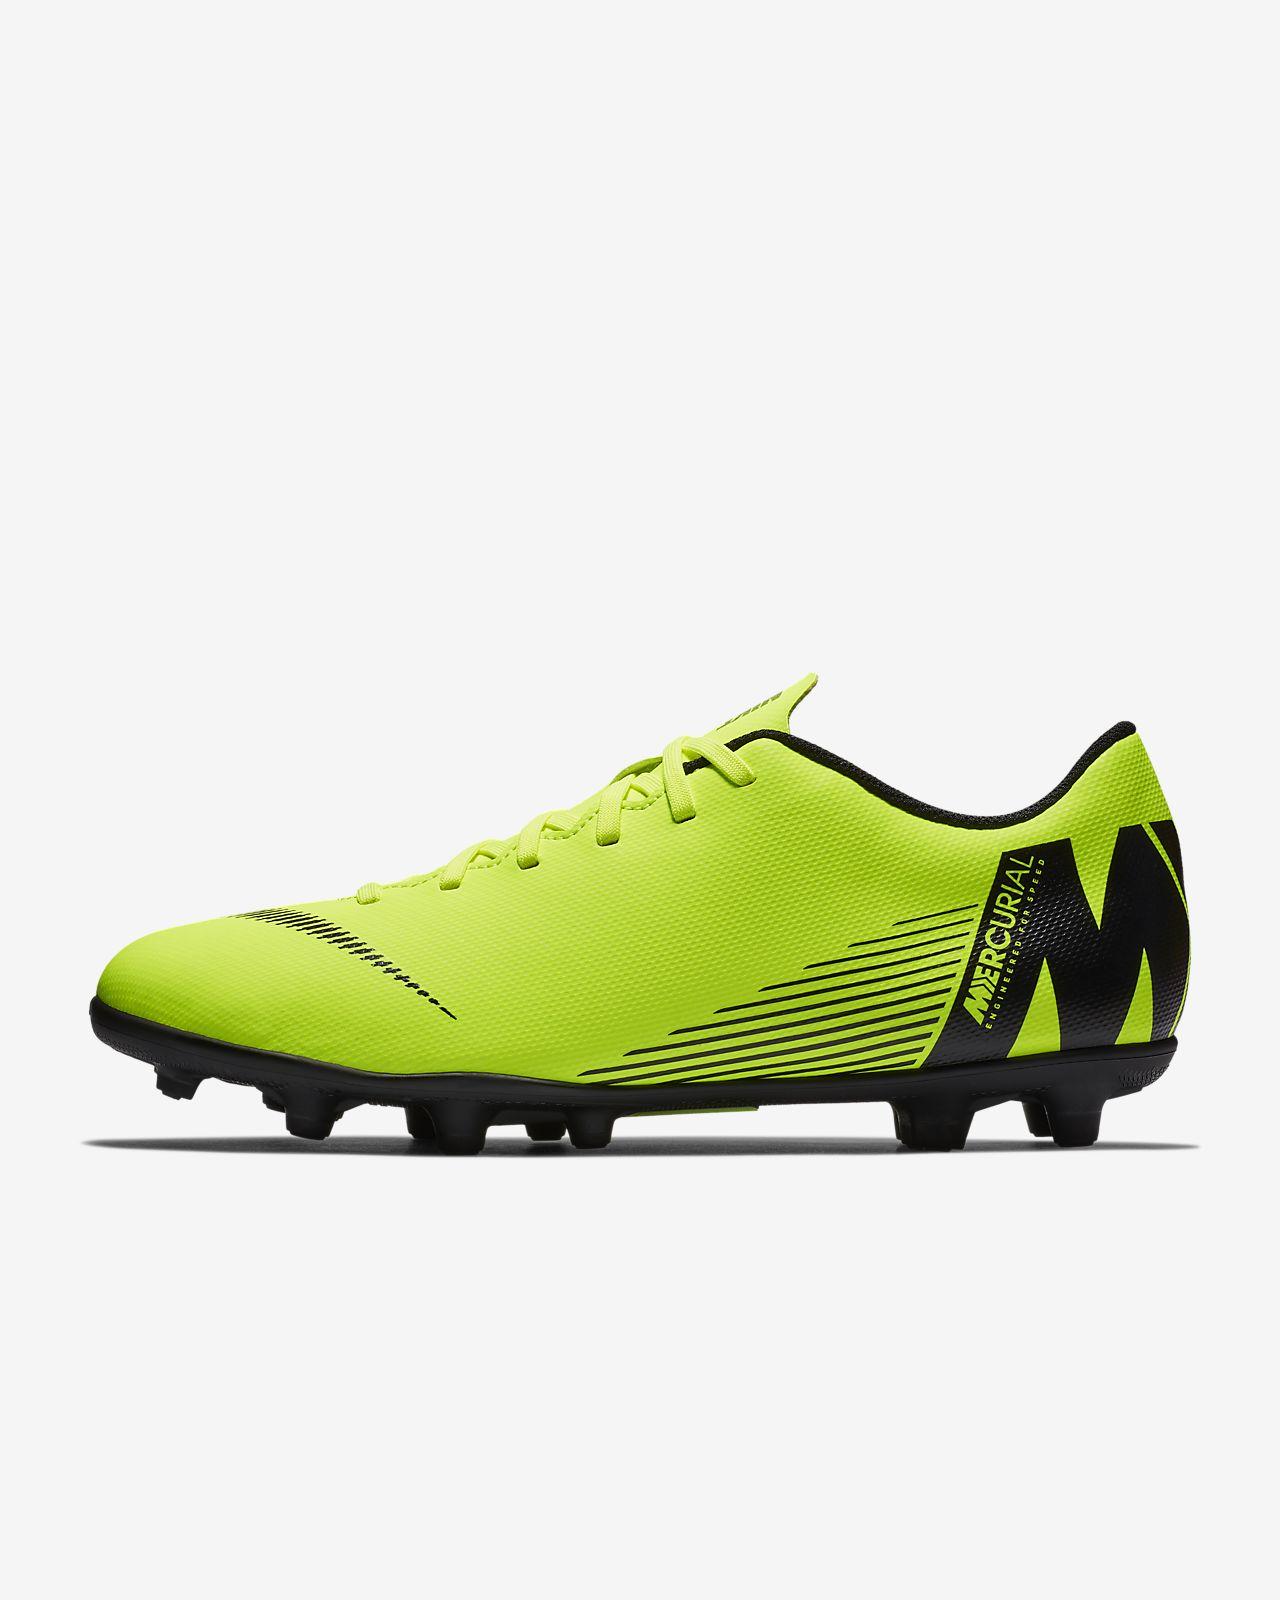 sports shoes 0154b 4d3de Nike Mercurial Vapor XII Club Botas de fútbol para múltiples superficies